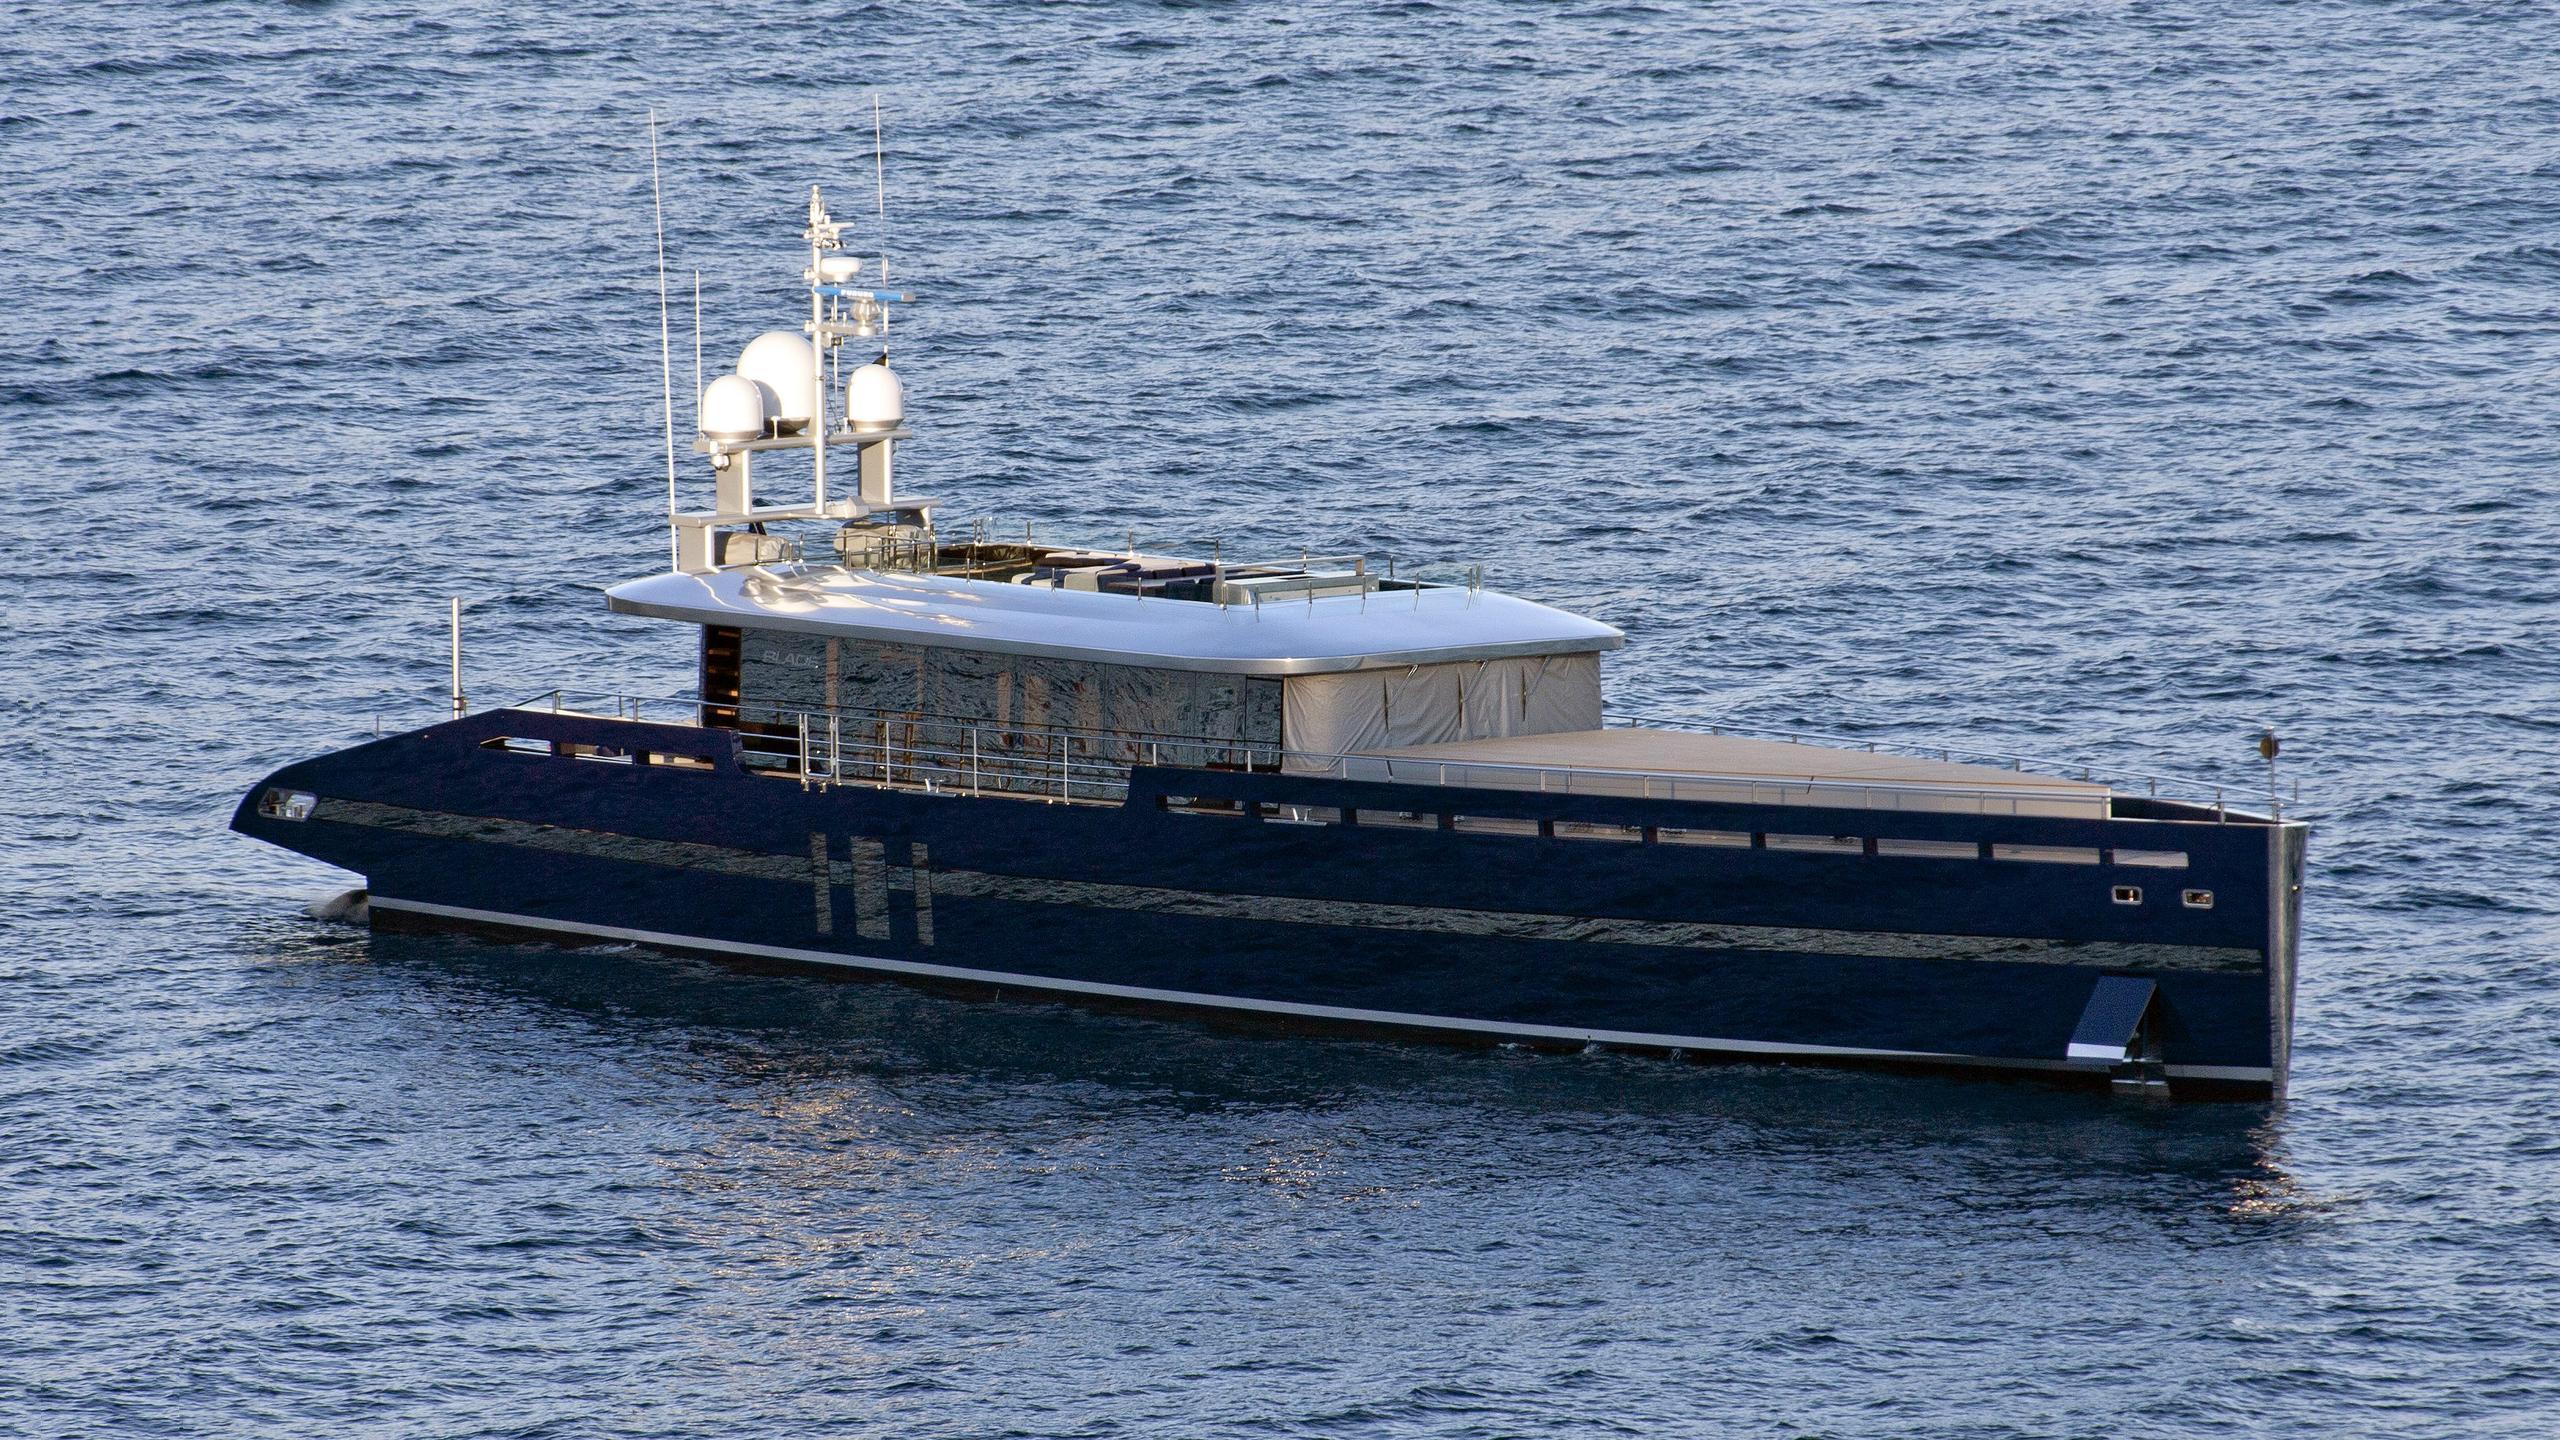 blade-motor-yacht-mmgi-2010-44m-exterior